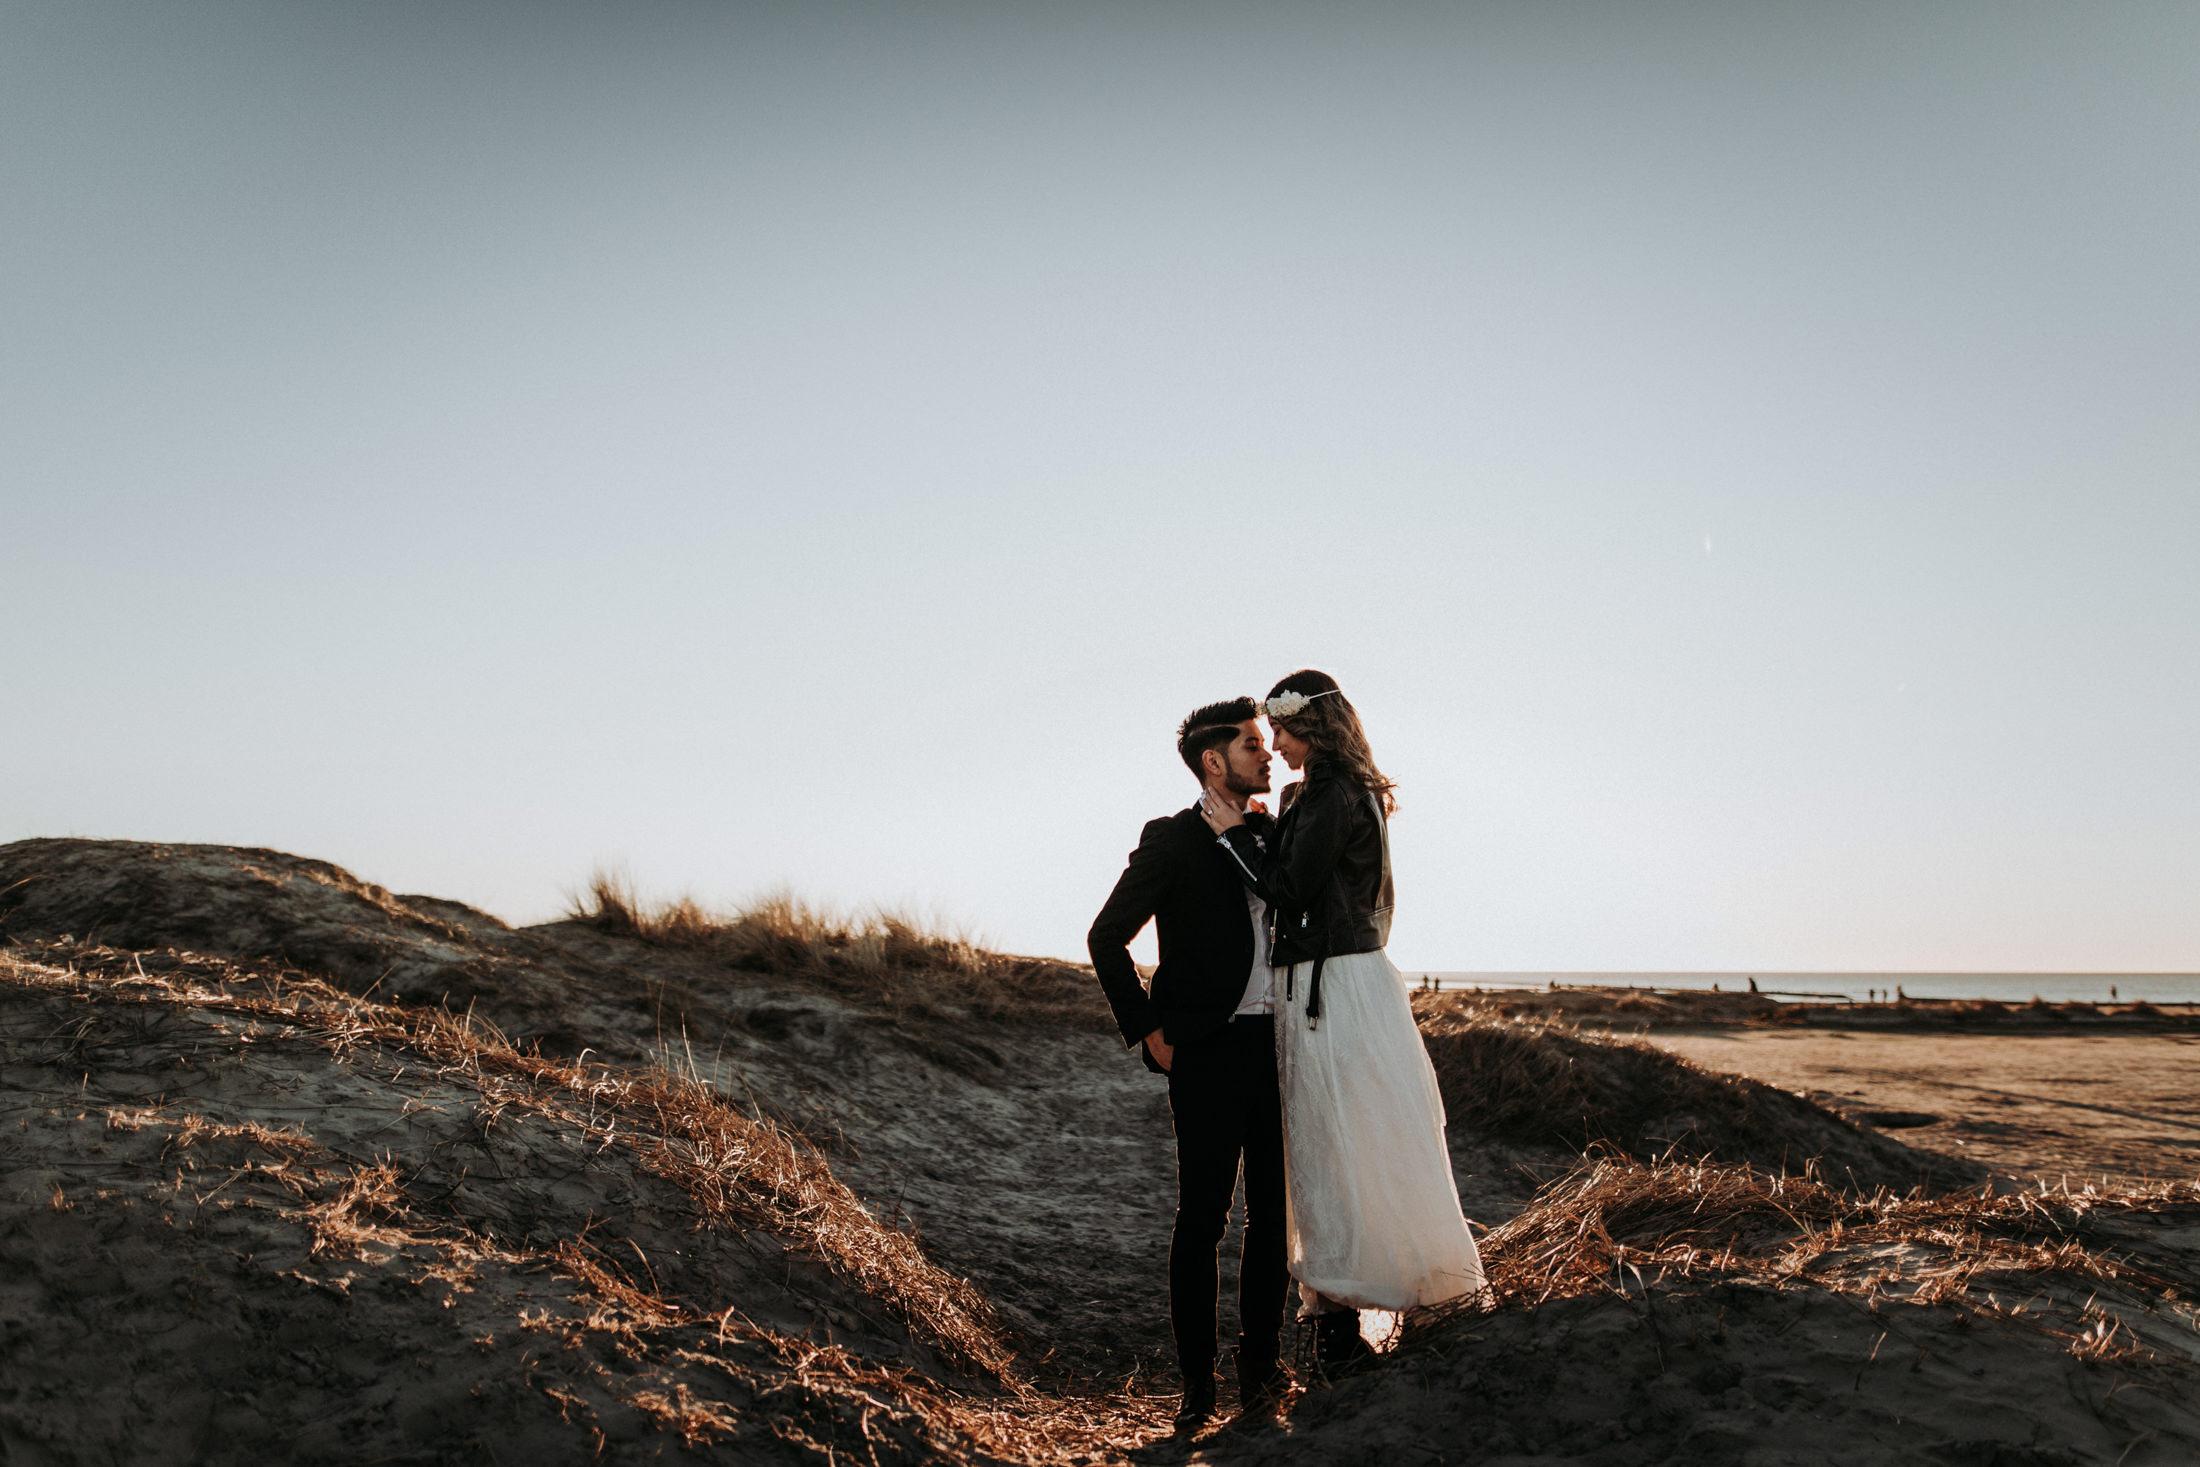 Wedding_Photographer_Mallorca_Daniela-Marquardt_Photography_CanaryIslands_Lanzarote_Iceland_Tuskany_Santorini_Portugal_Schweiz_Austria_Bayern_Elopement_Hochzeitsfotograf_Norddeichich_18